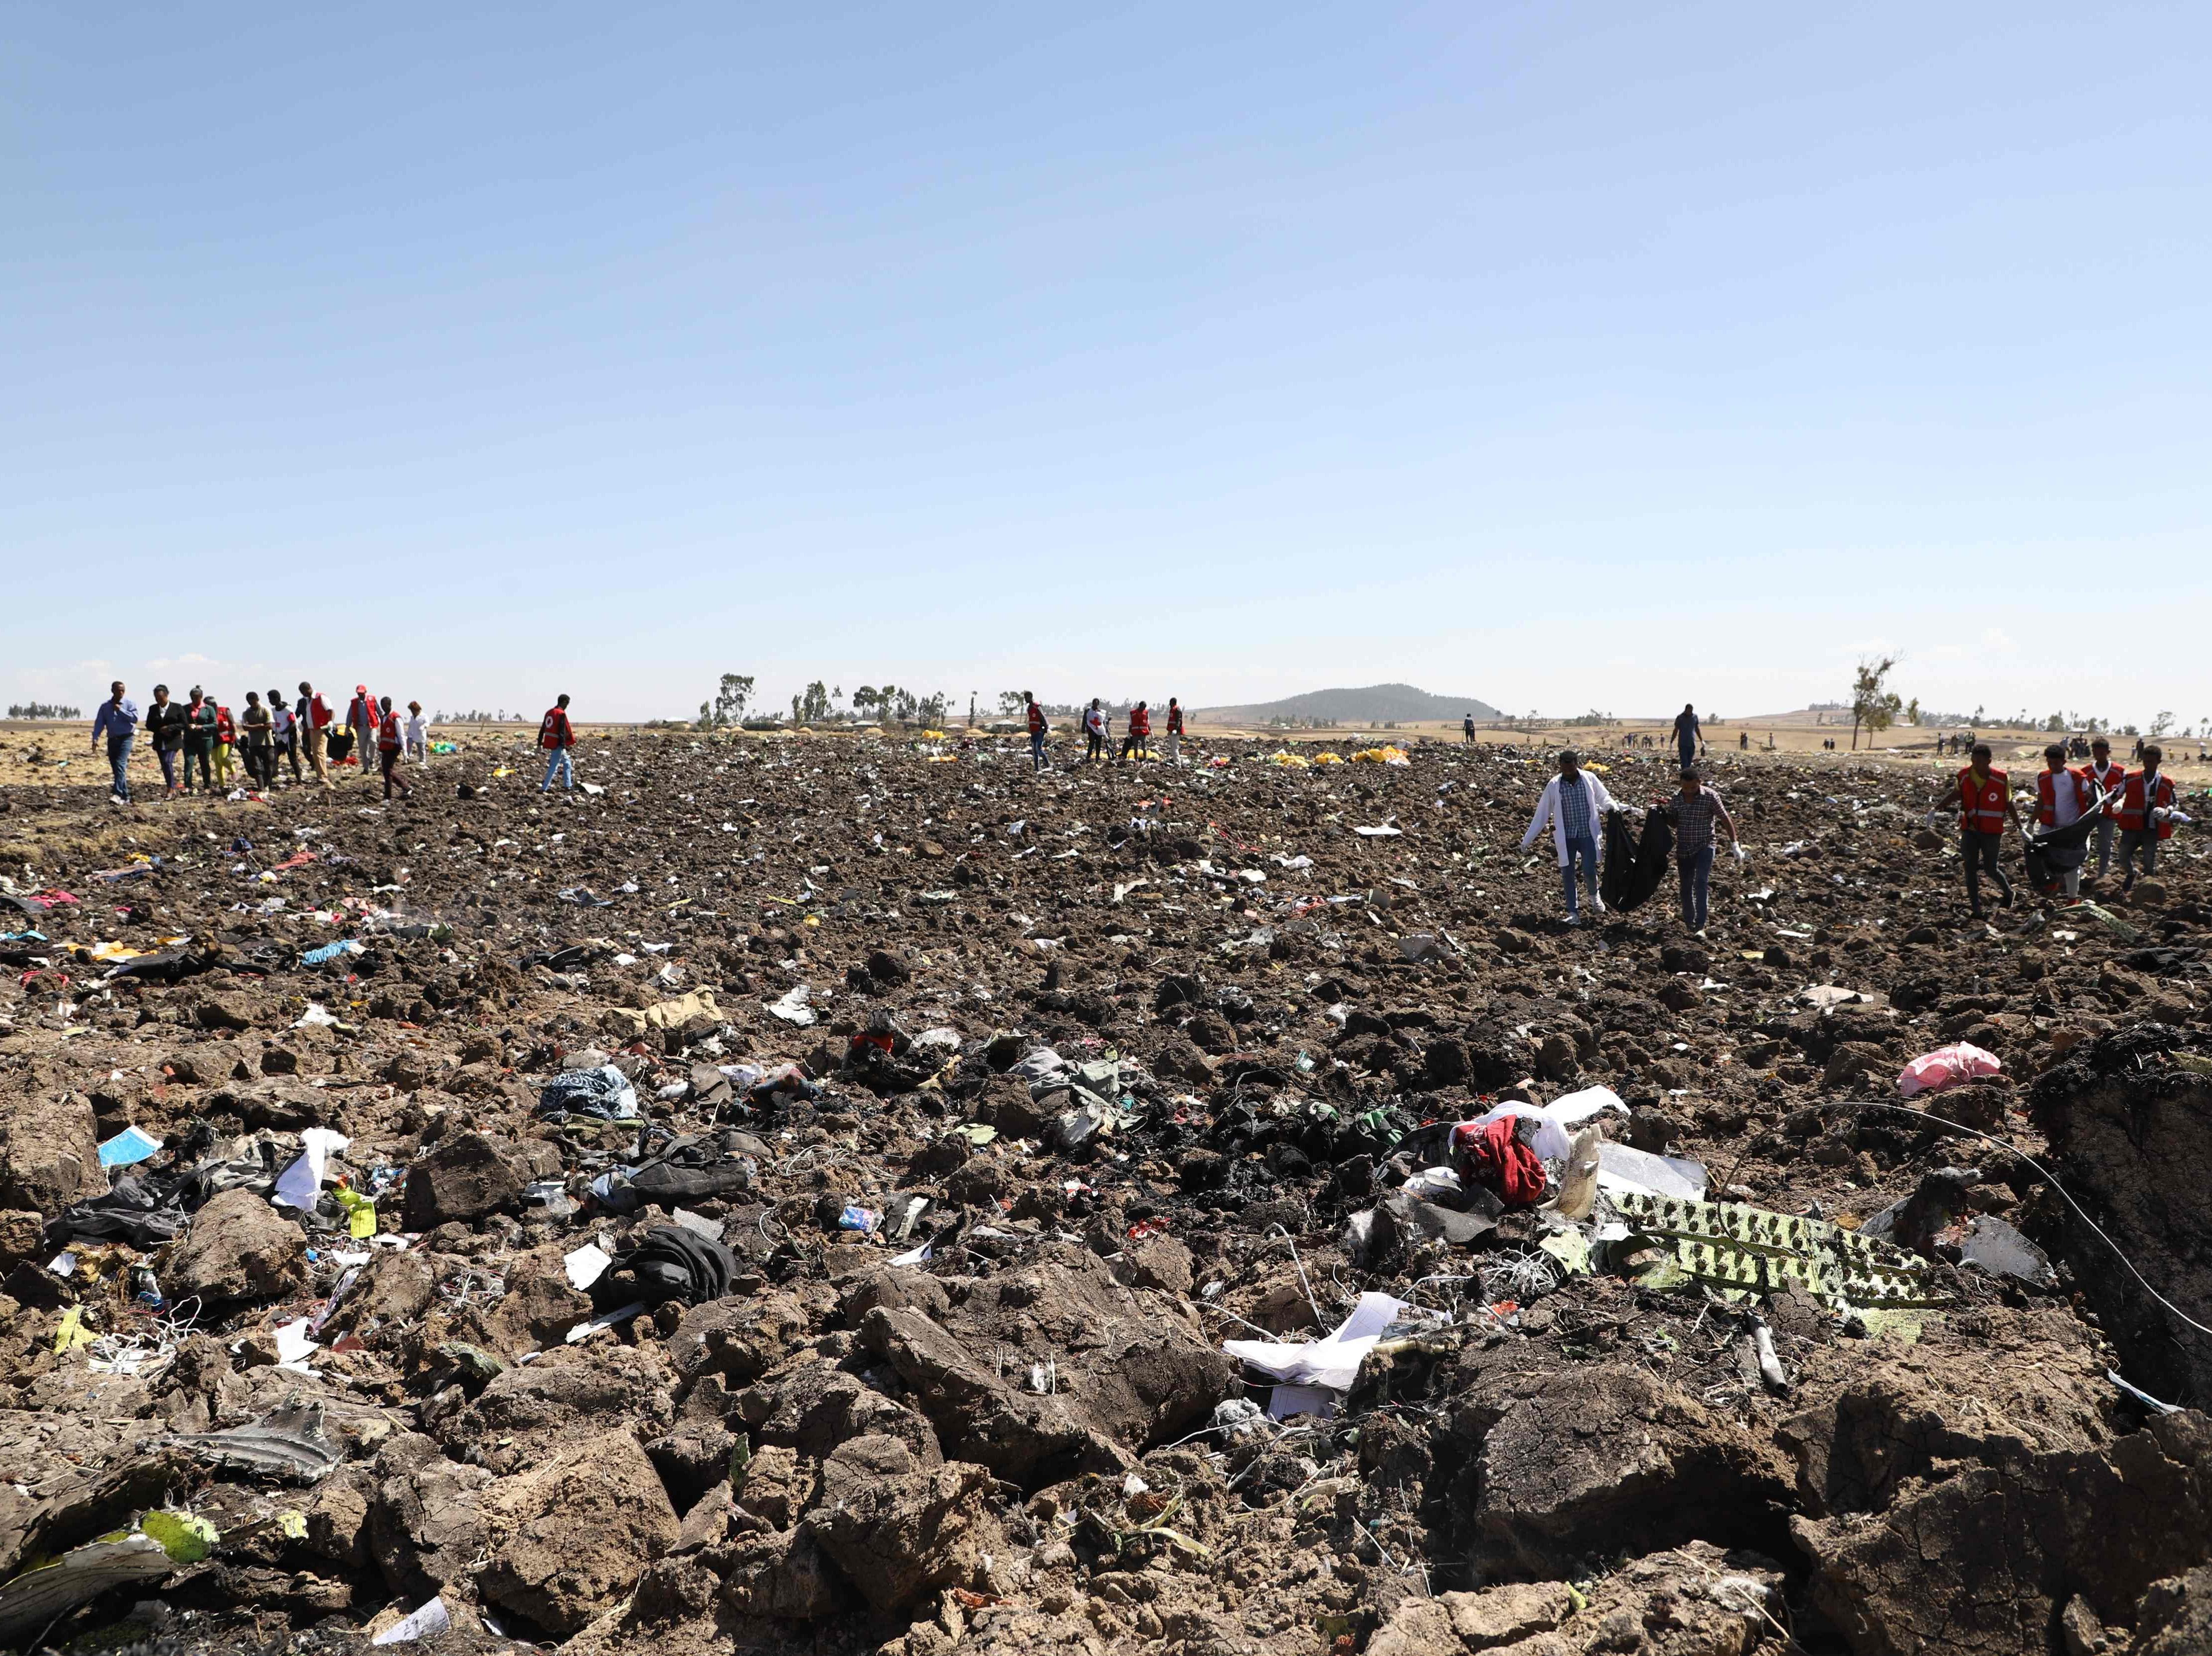 Rescue teams collect bodies at the crash site of Ethiopia Airlines Flight 302 near Bishoftu, Ethiopia.